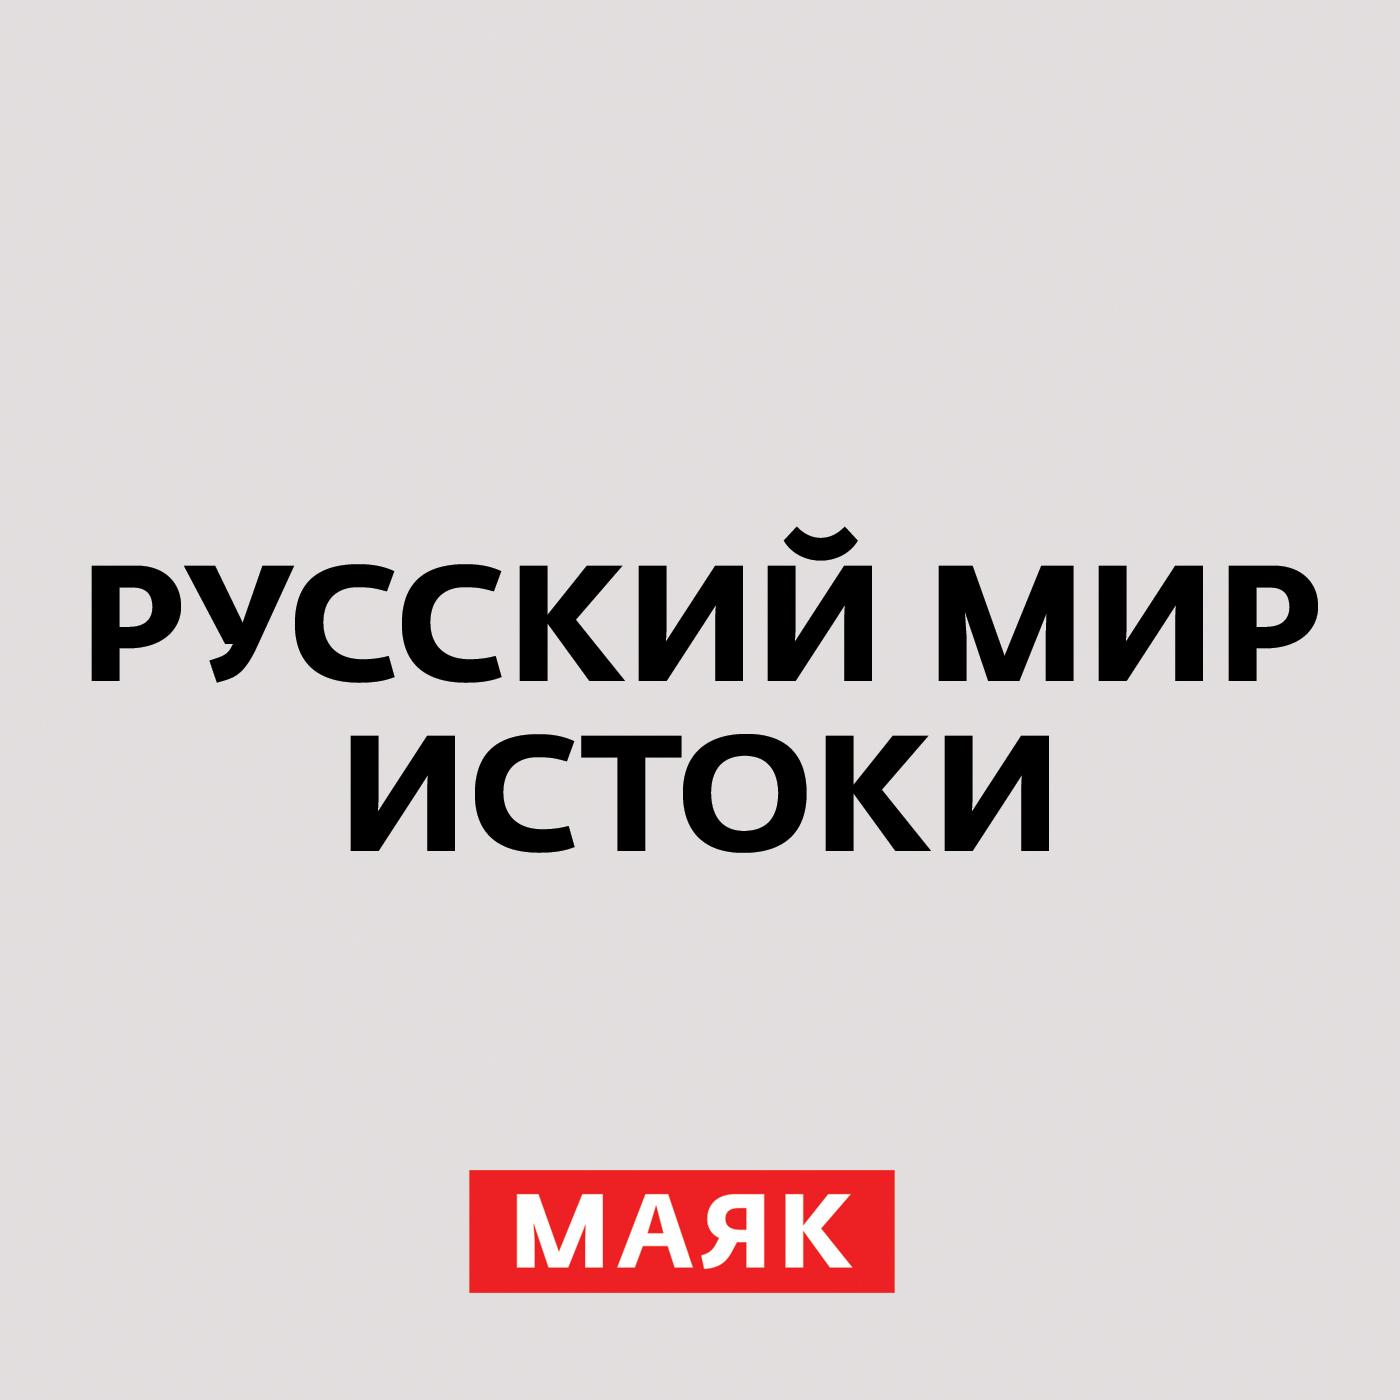 Творческий коллектив радио «Маяк» Великий князь Ярослав творческий коллектив радио маяк великий князь ярослав